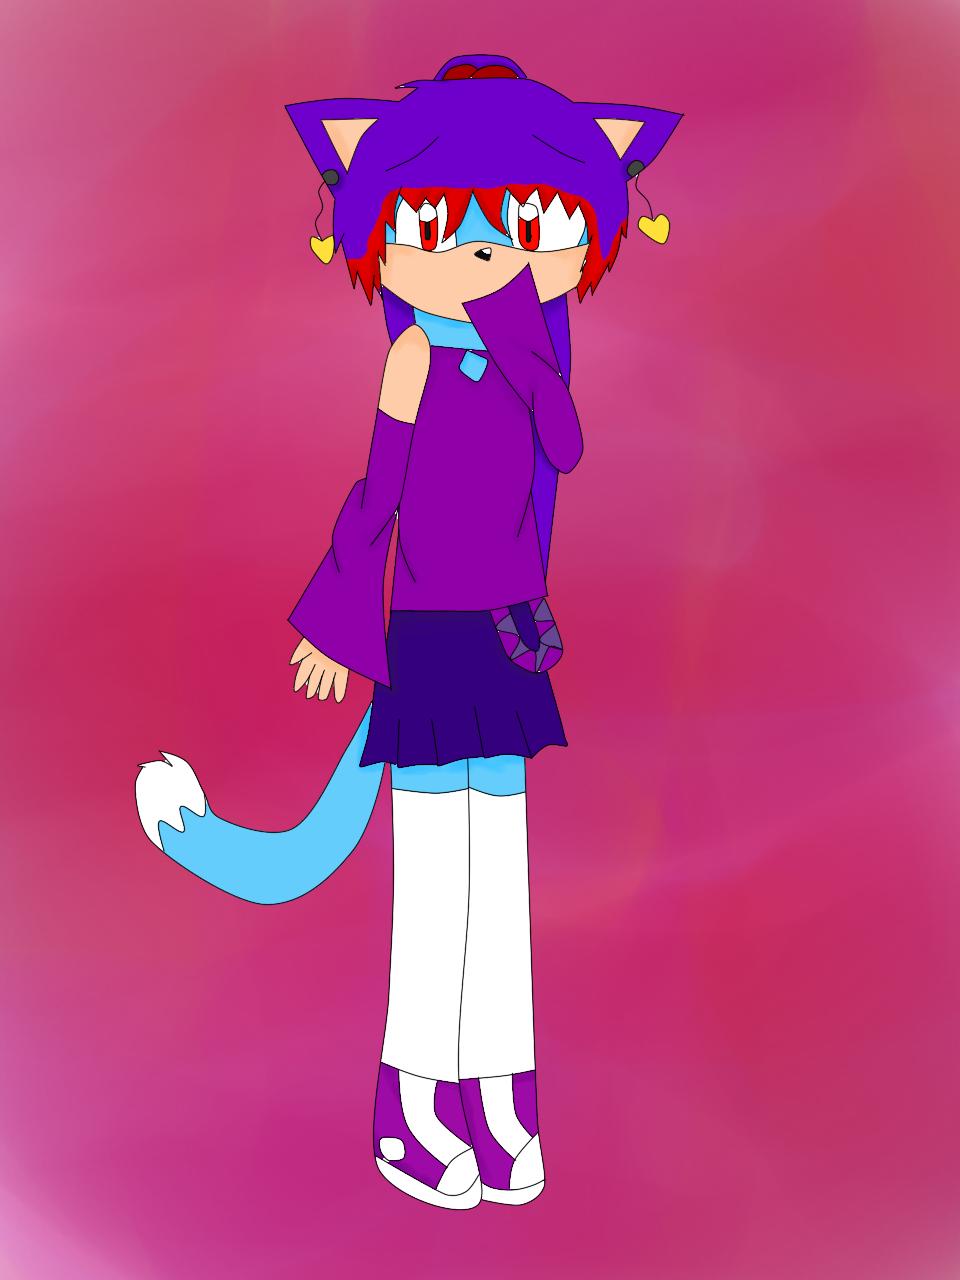 My Sonic OC Hikumi